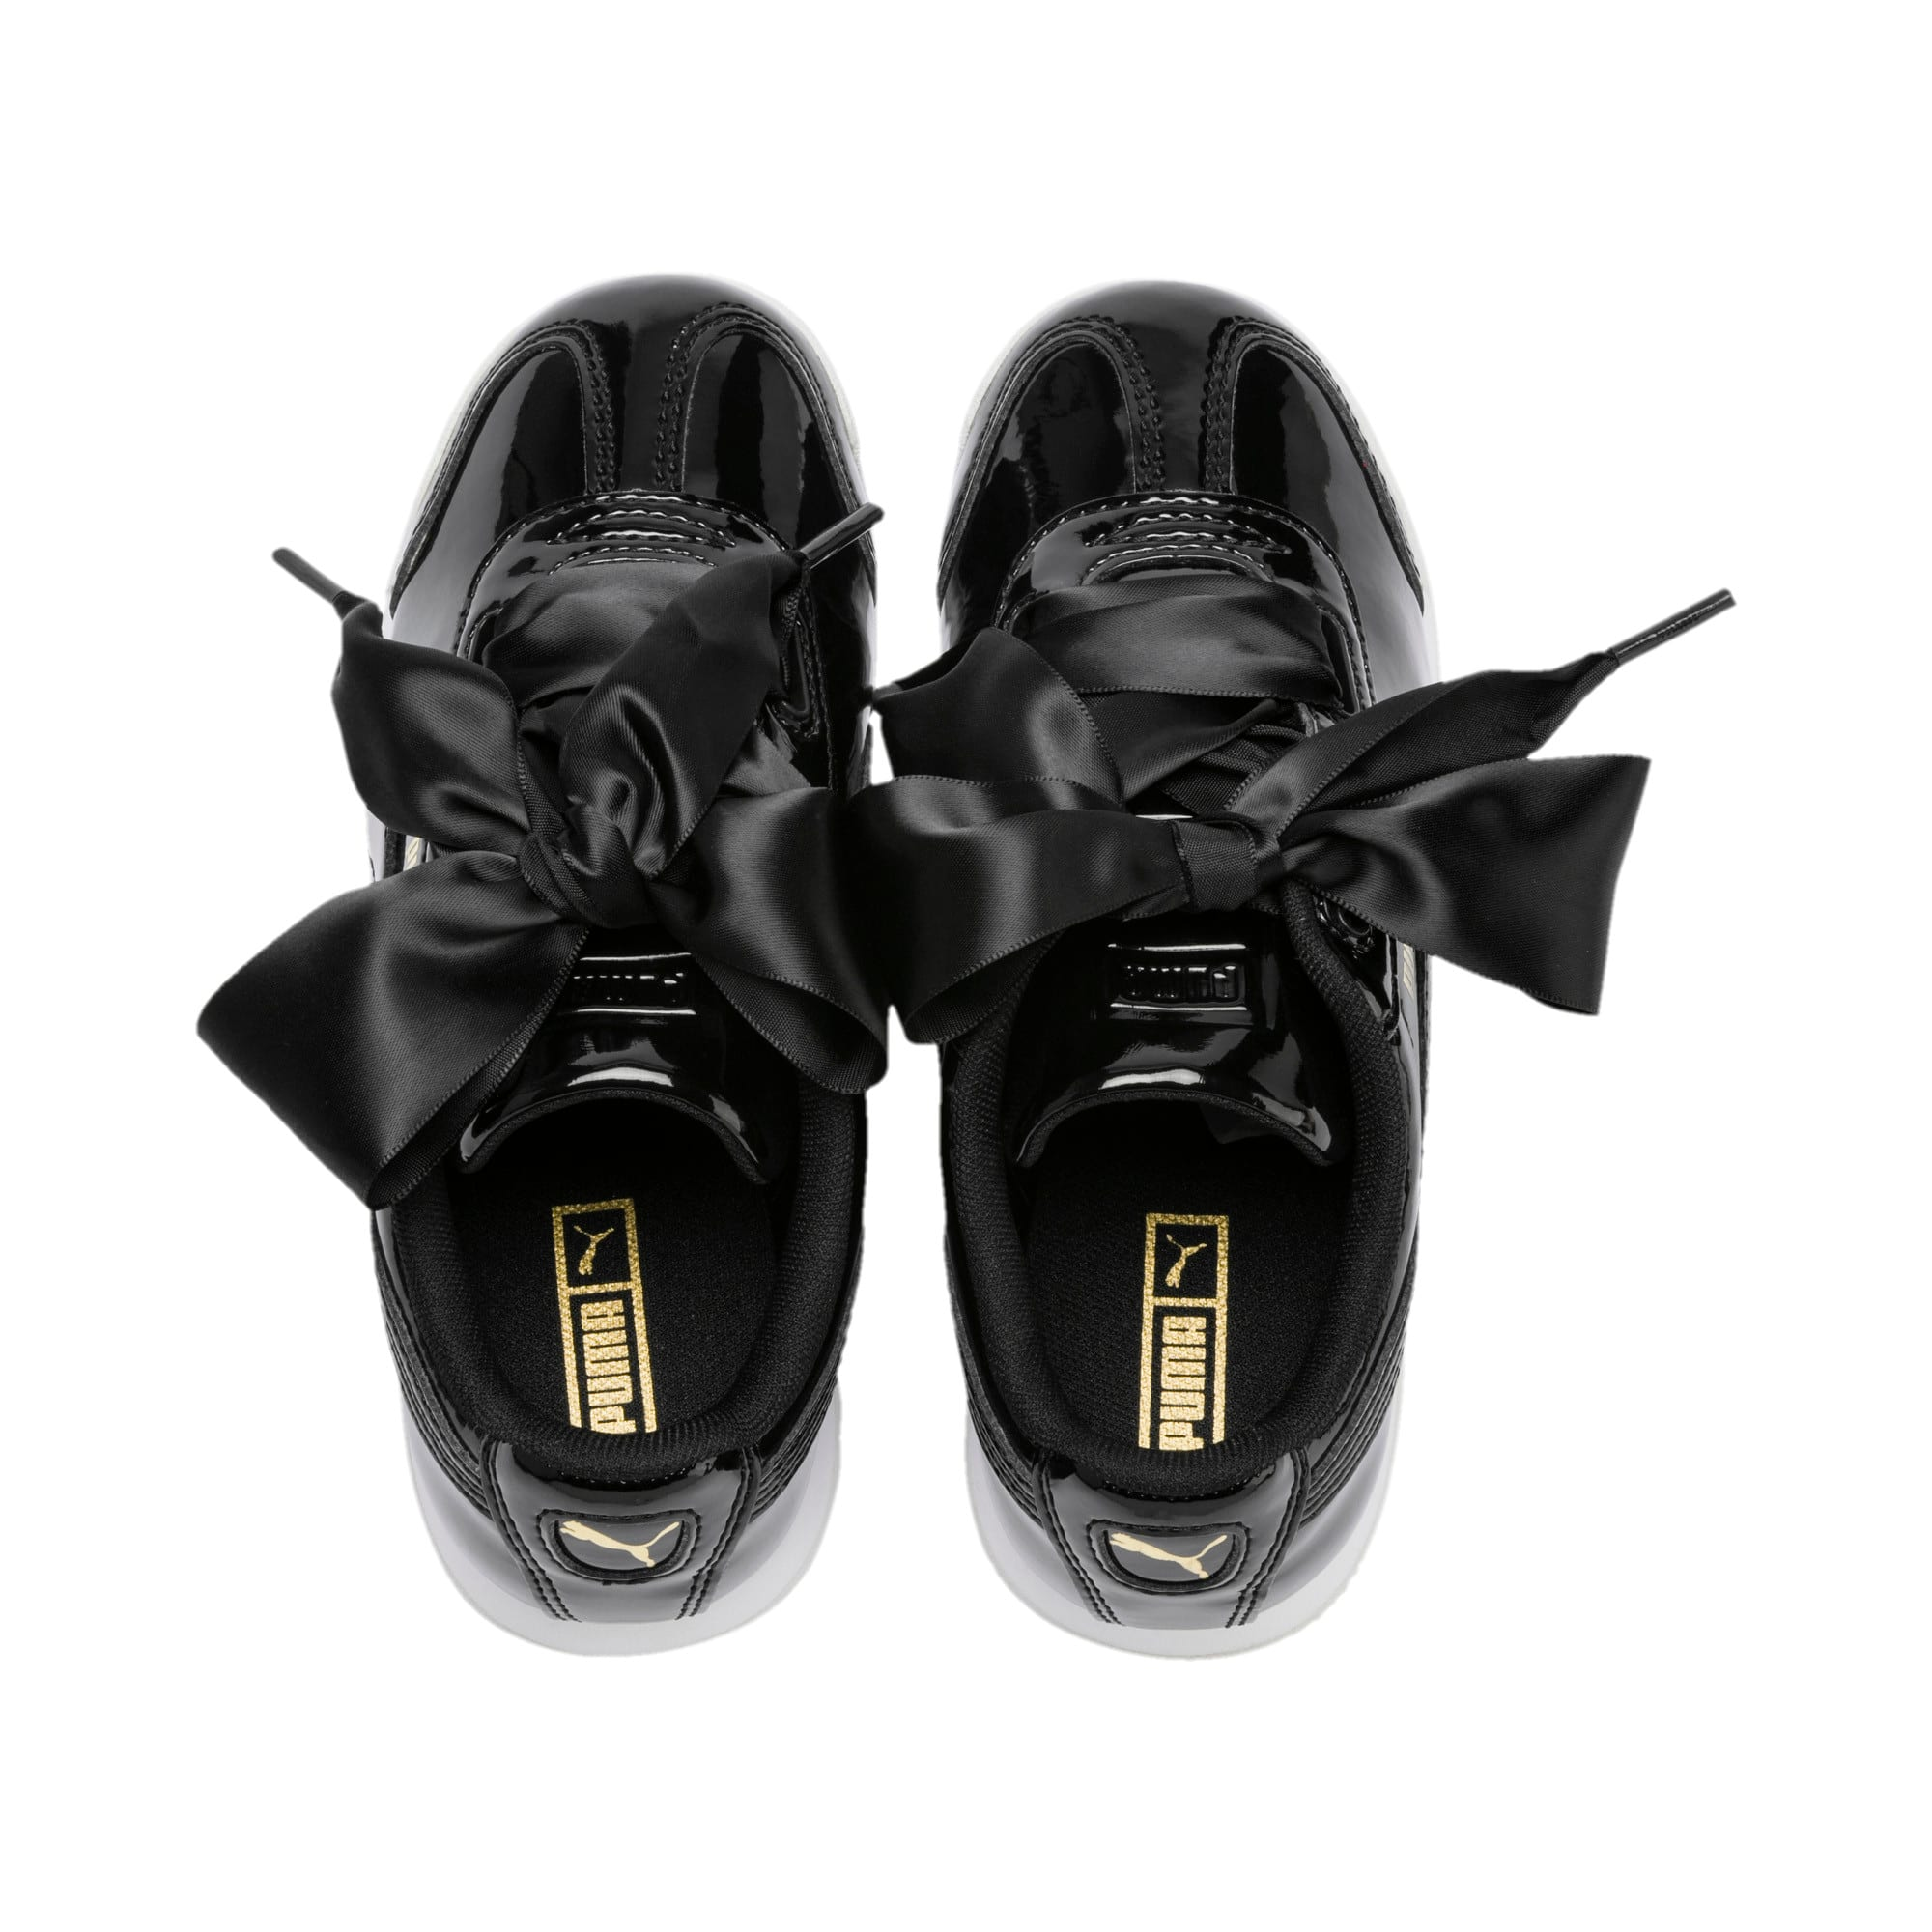 Thumbnail 6 of Roma Heart Patent Kids Sneaker, Puma Black, medium